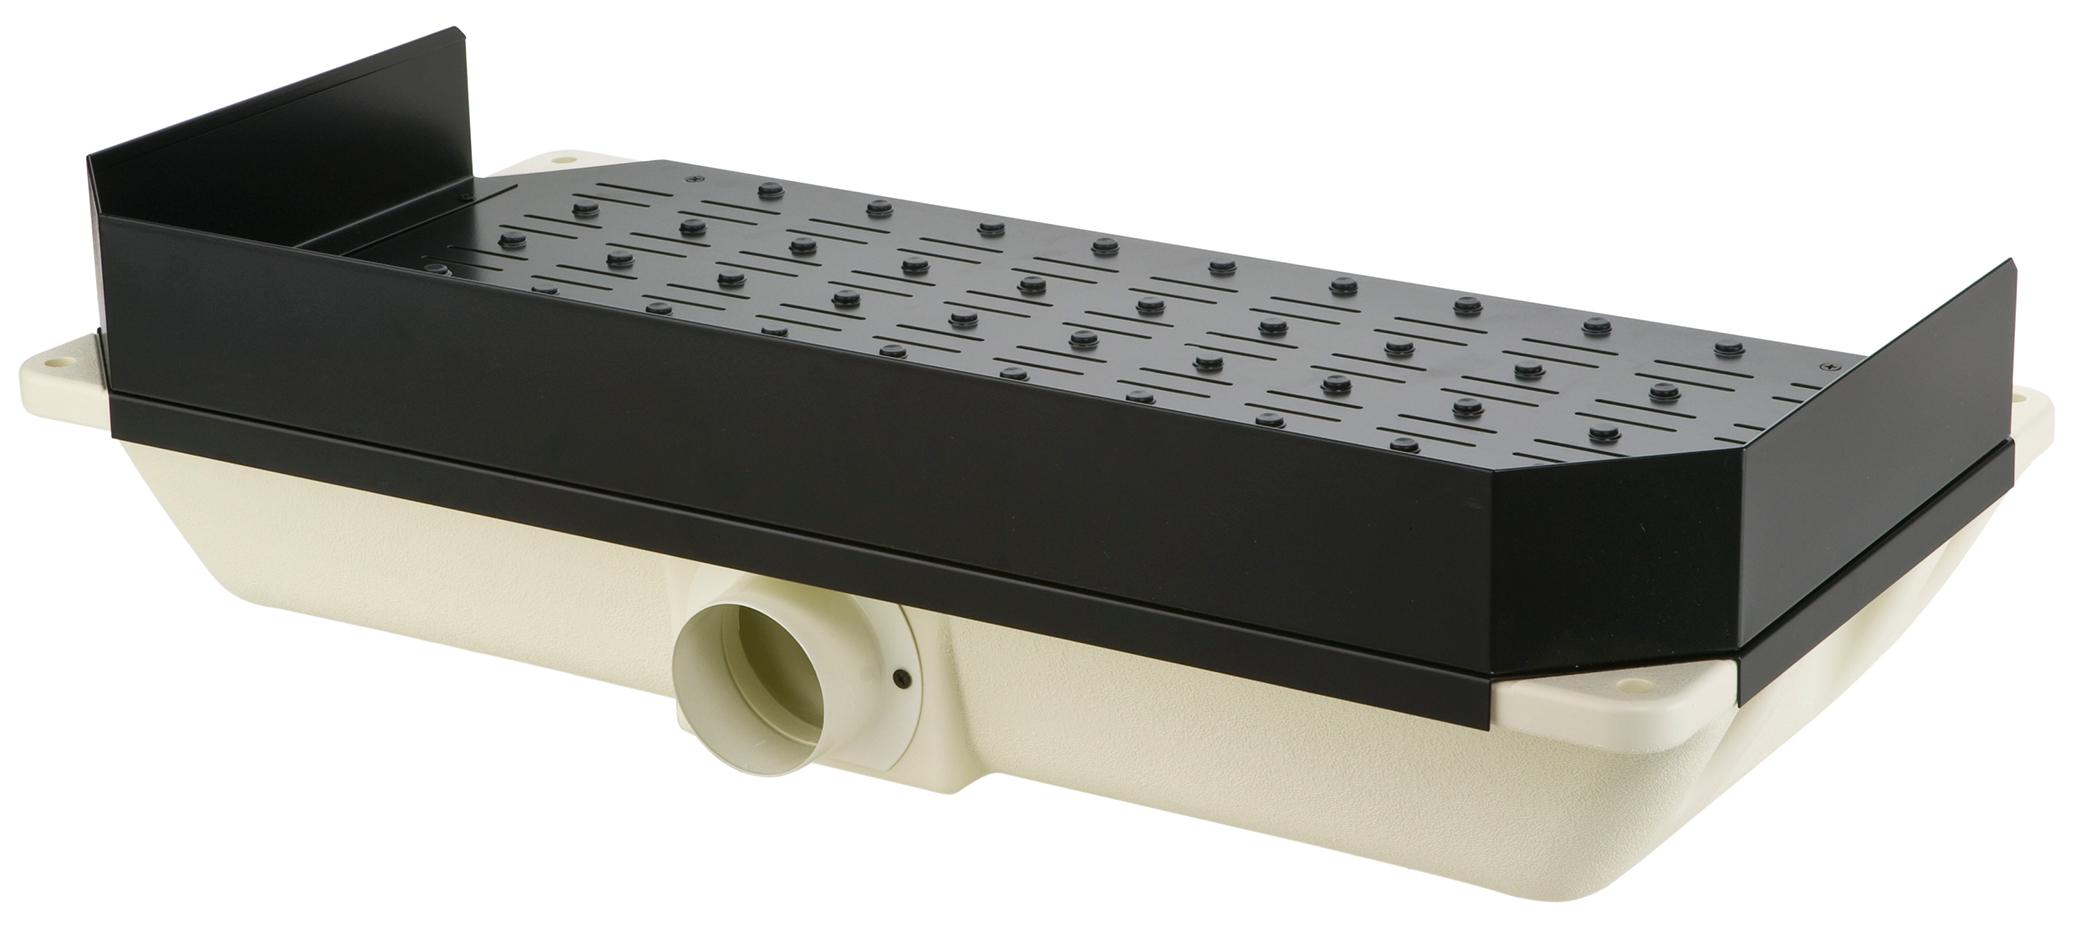 Portable Downdraft Bench : Shop fox w a downdraft table inch by amazon